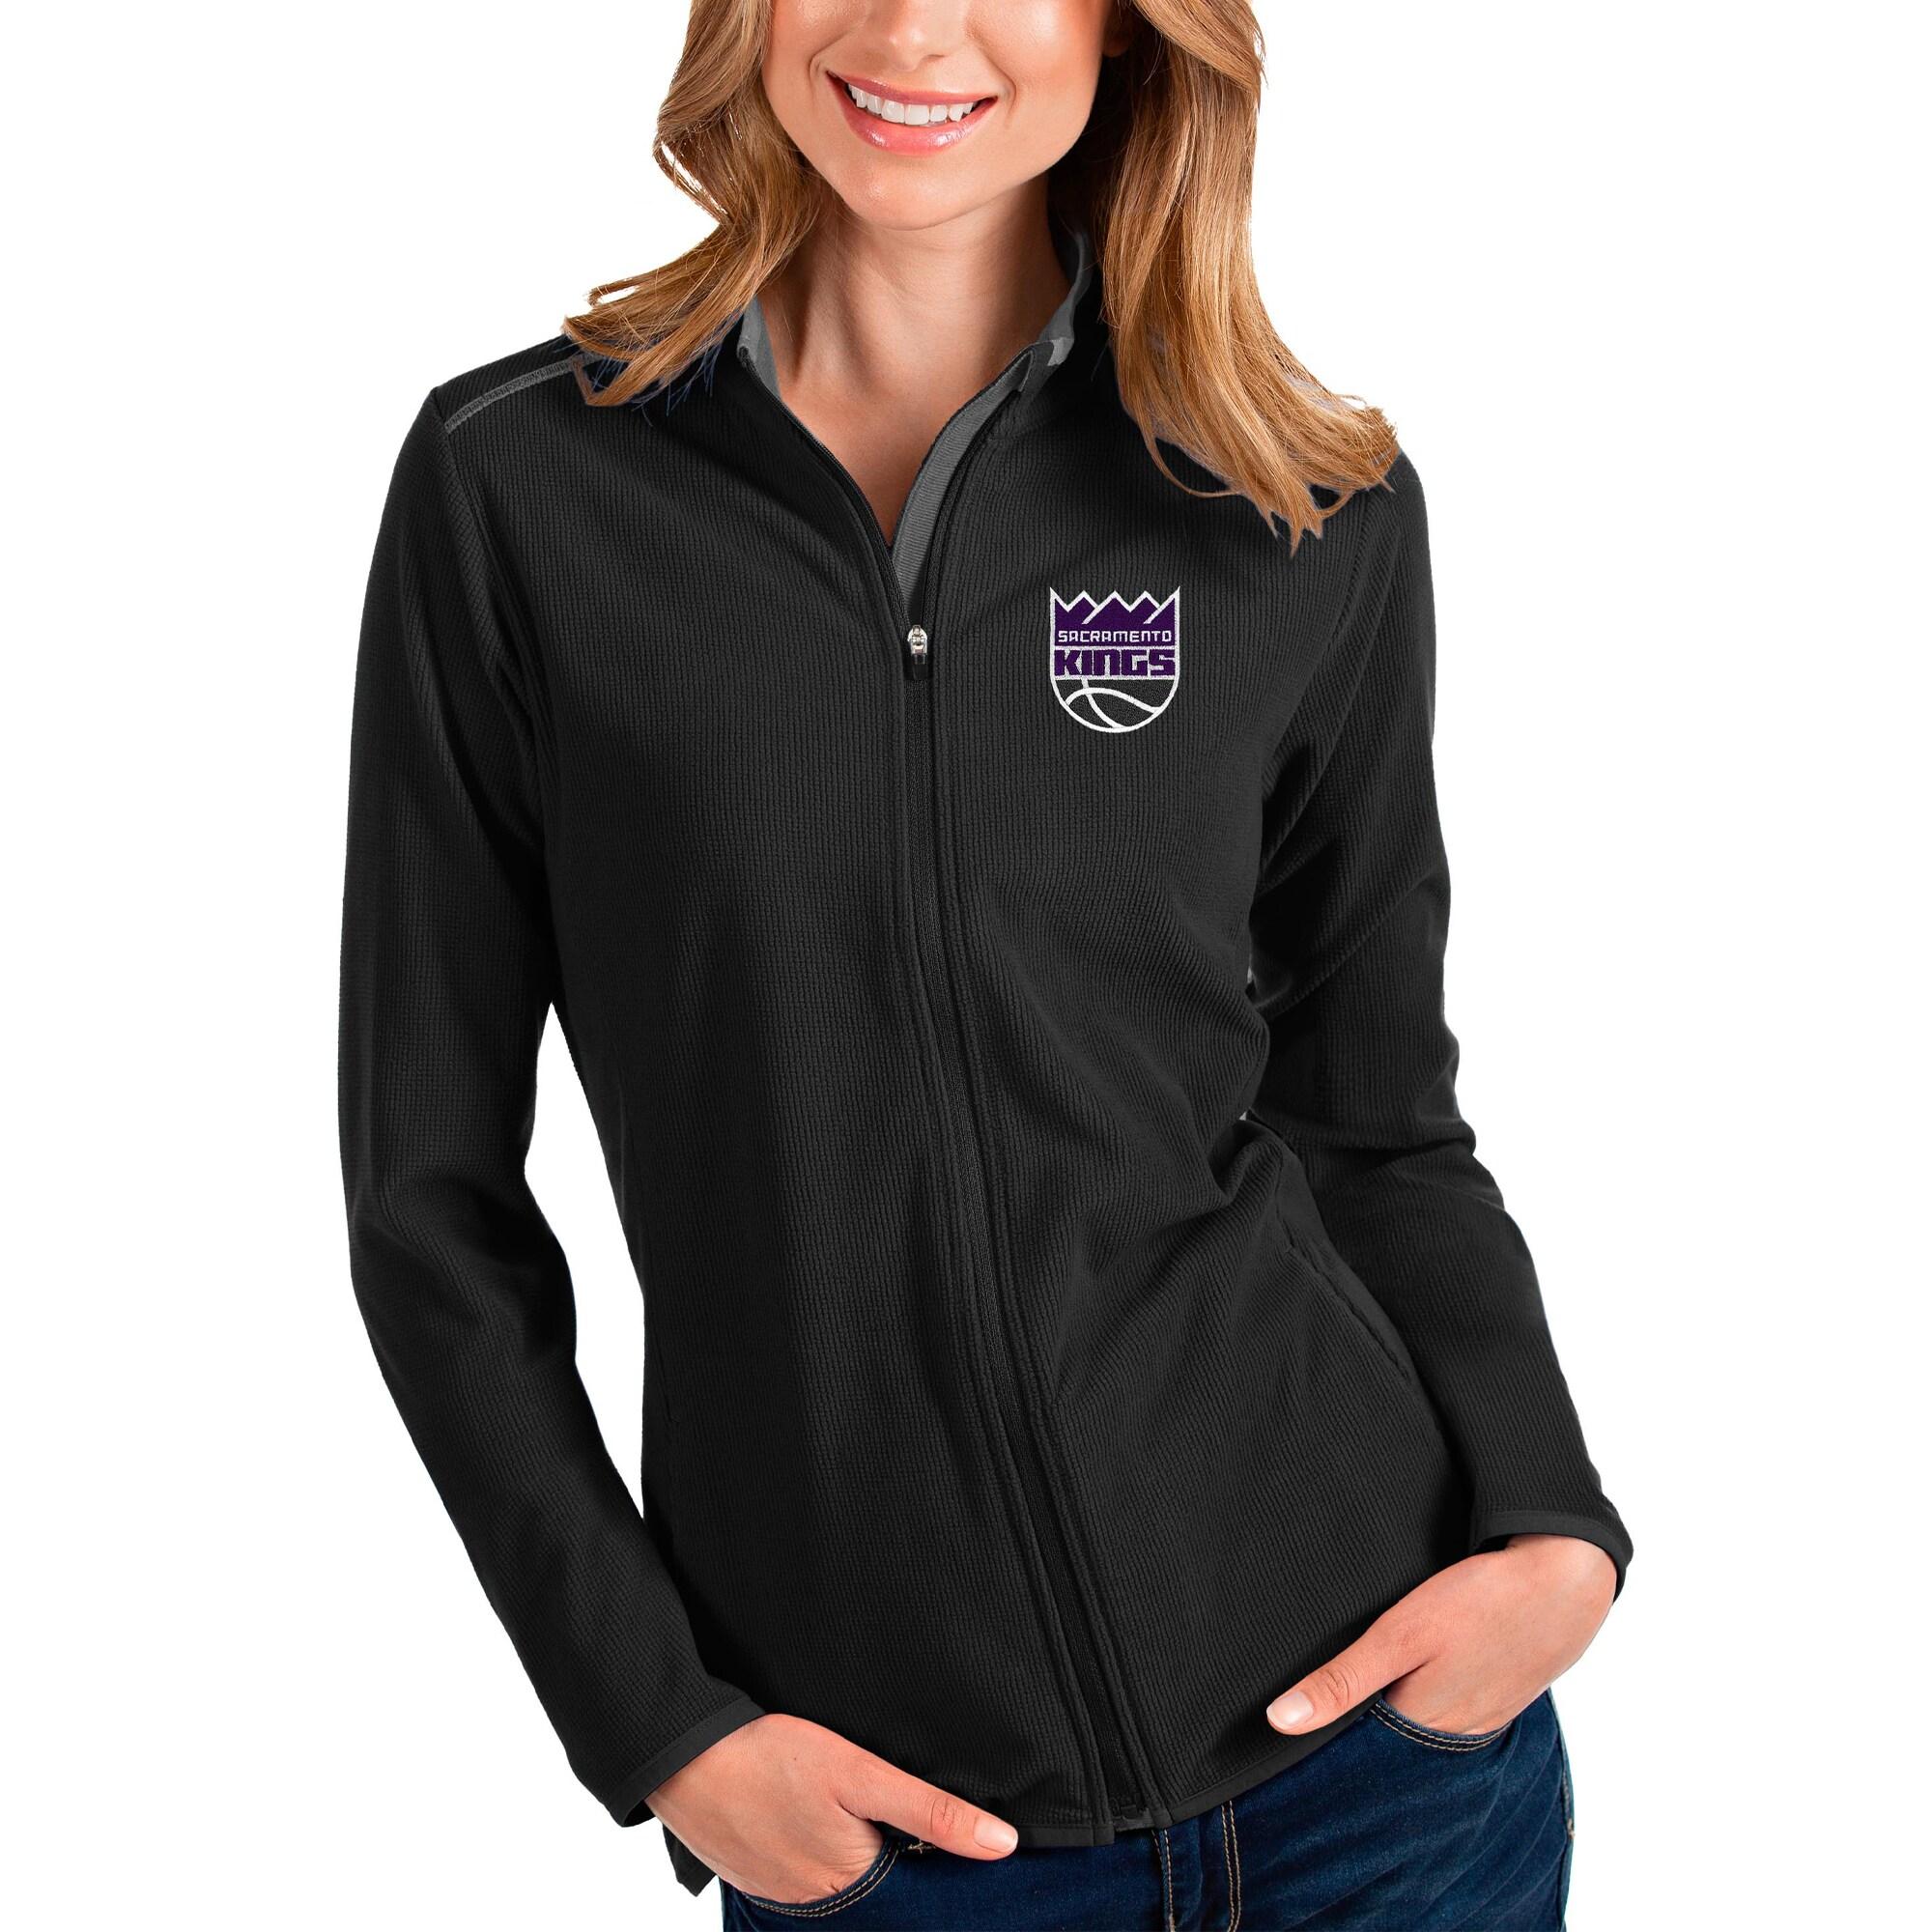 Sacramento Kings Antigua Women's Glacier Full-Zip Jacket - Black/Gray